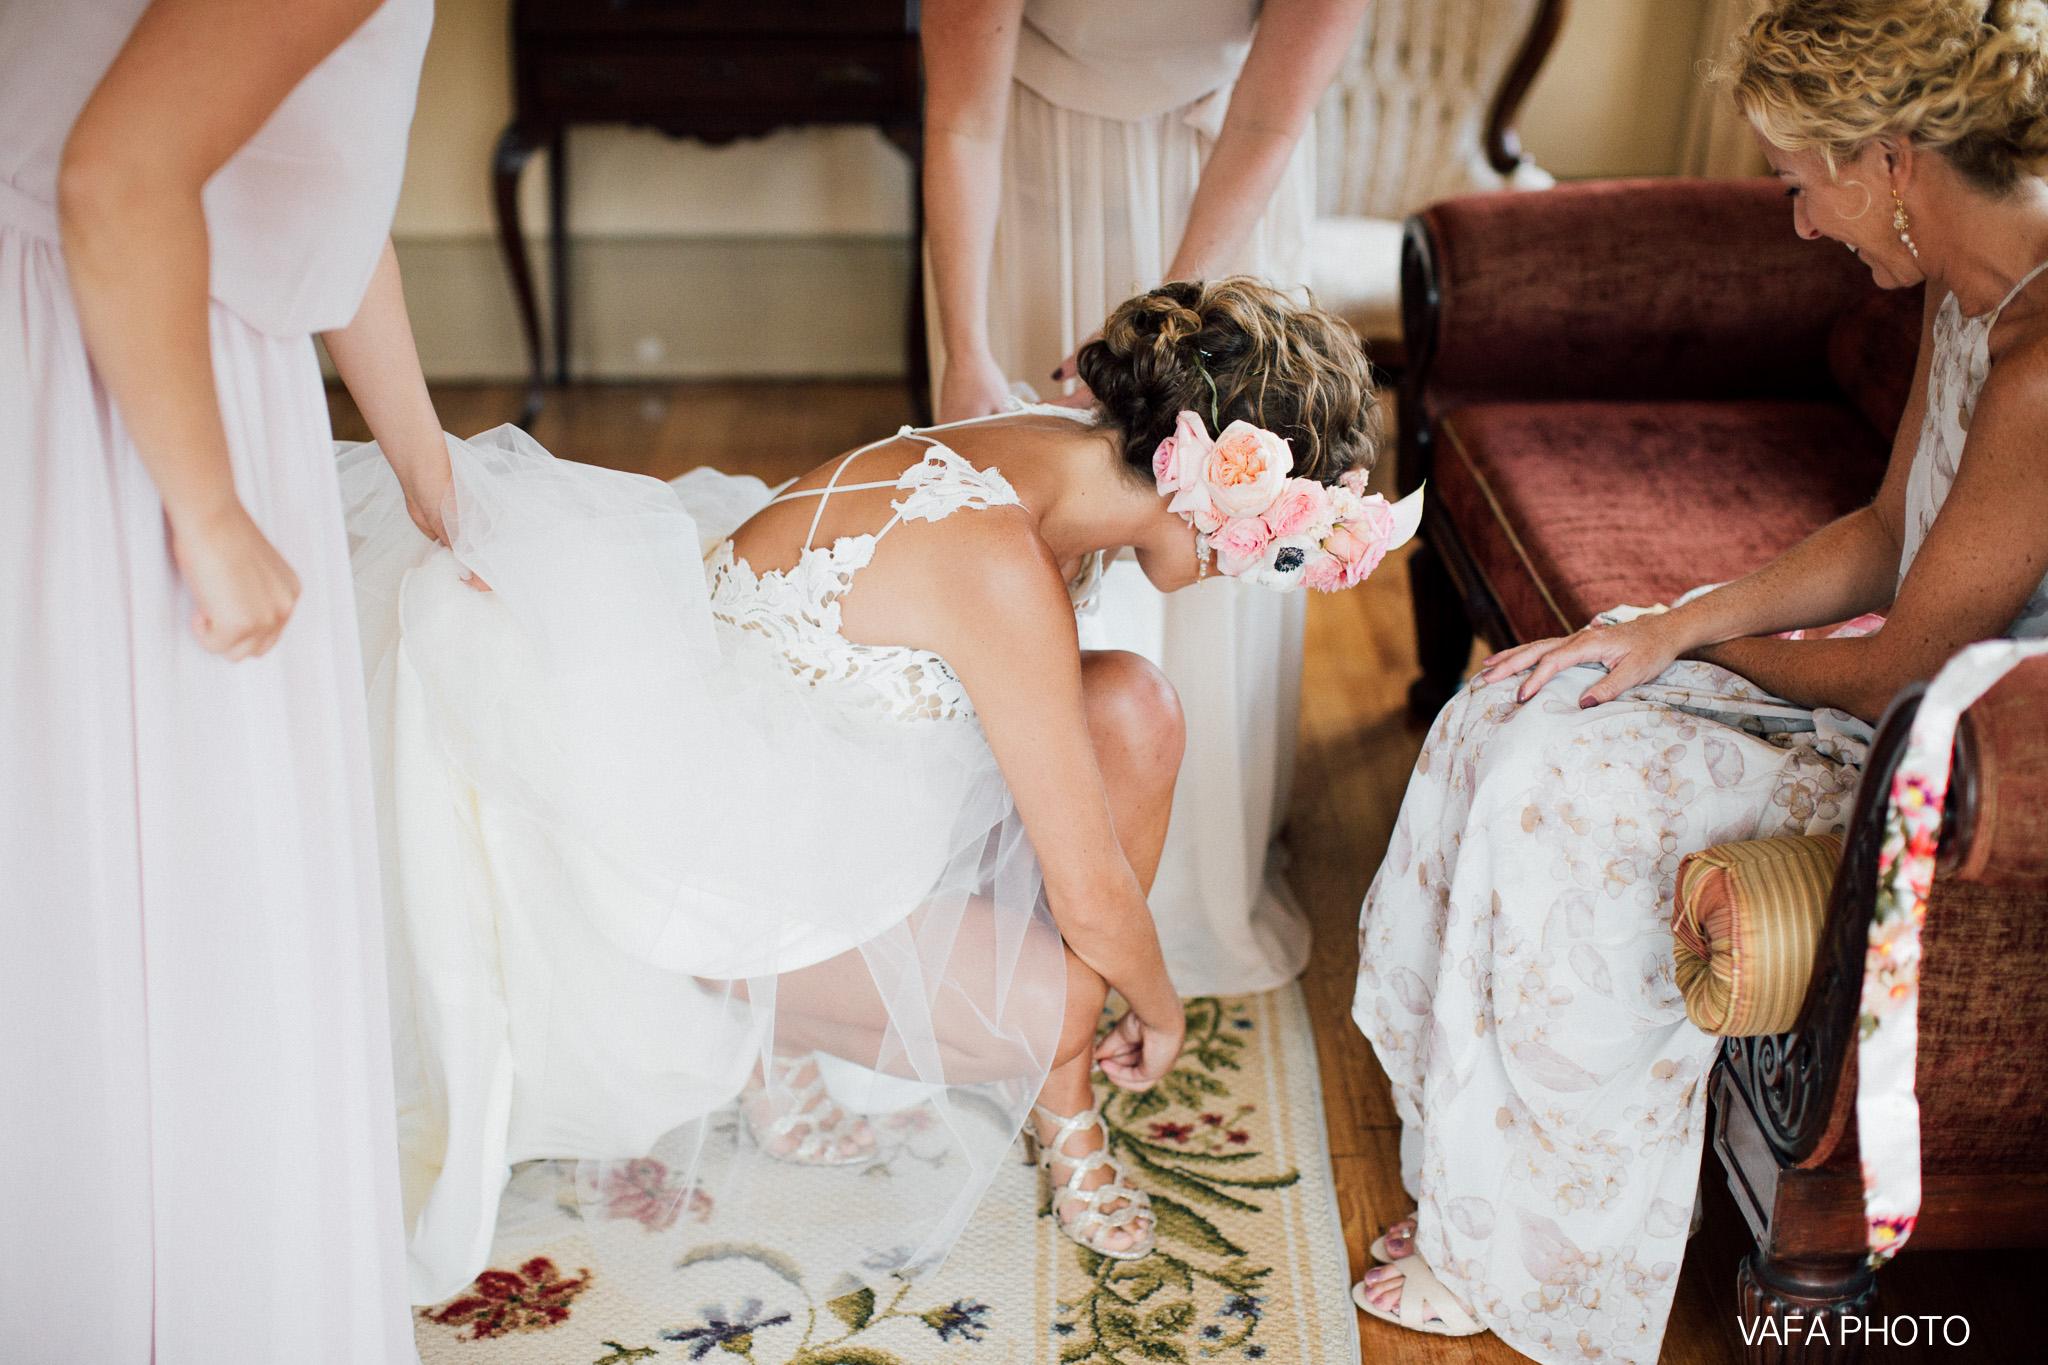 The-Felt-Estate-Wedding-Kailie-David-Vafa-Photo-169.jpg